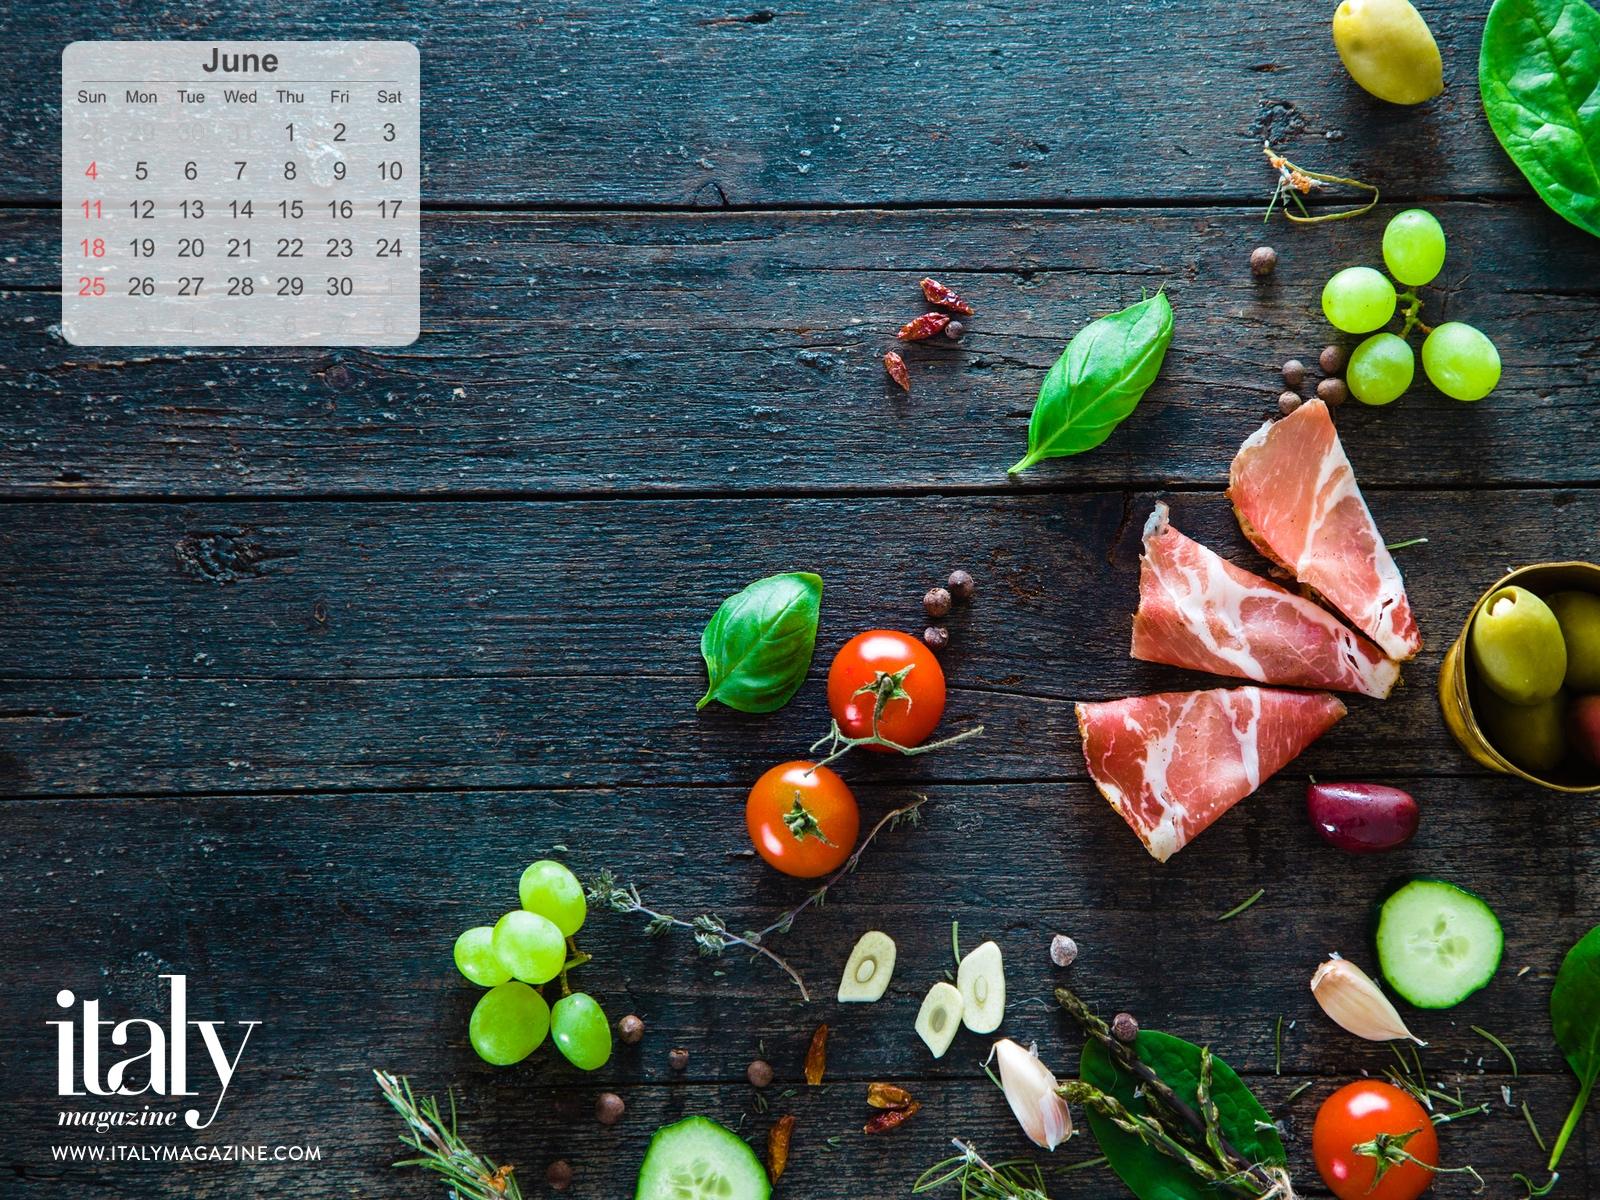 Wallpaper Calendar - June 2017 | ITALY Magazine